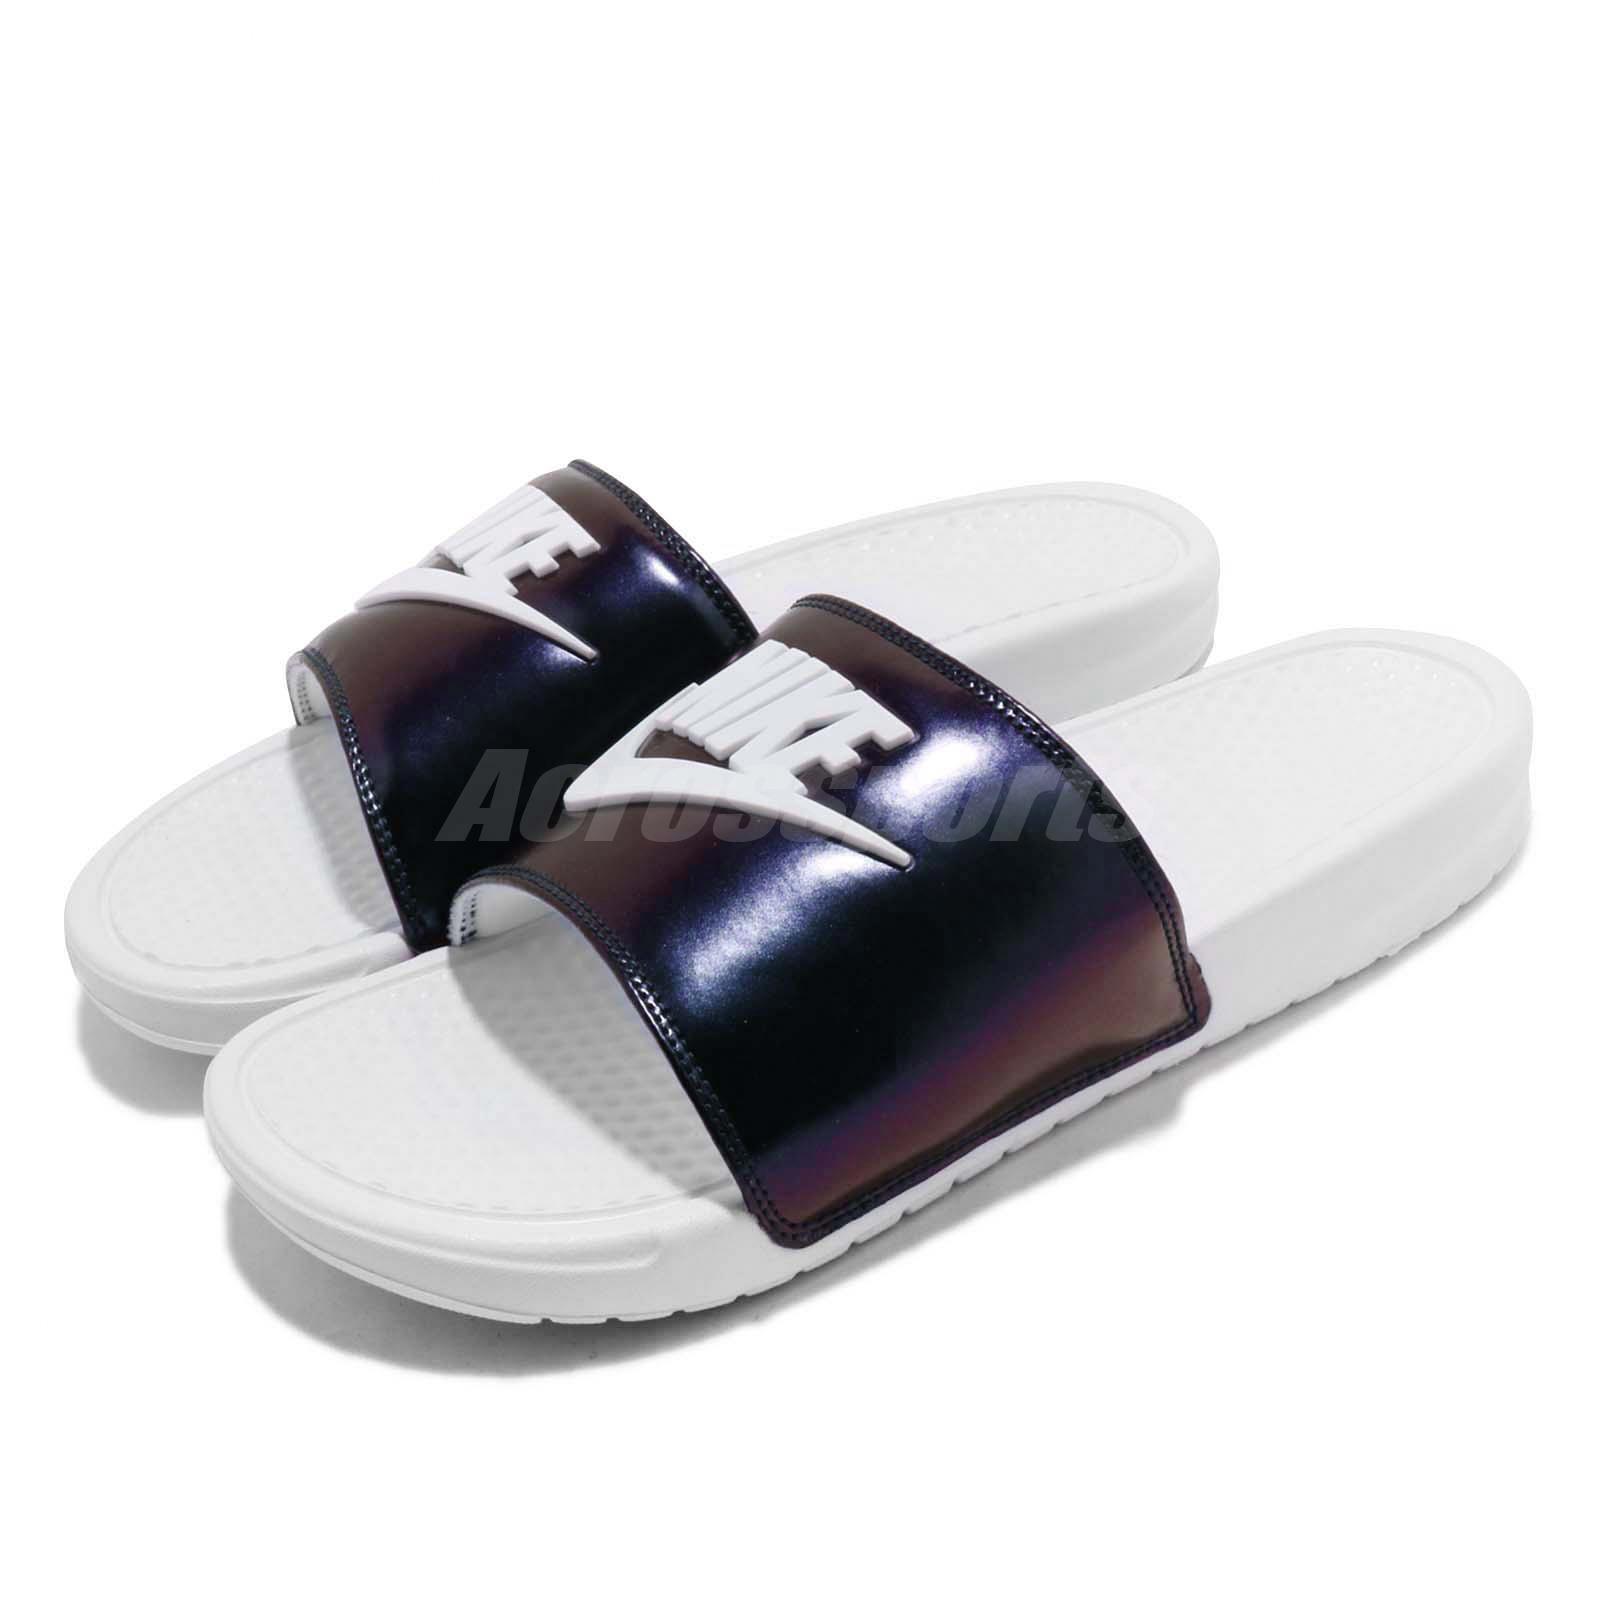 separation shoes f6453 4ceb5 Details about Nike Benassi JDI SE White Lucid Green Men Sports Sandals  Slides AJ6745-102